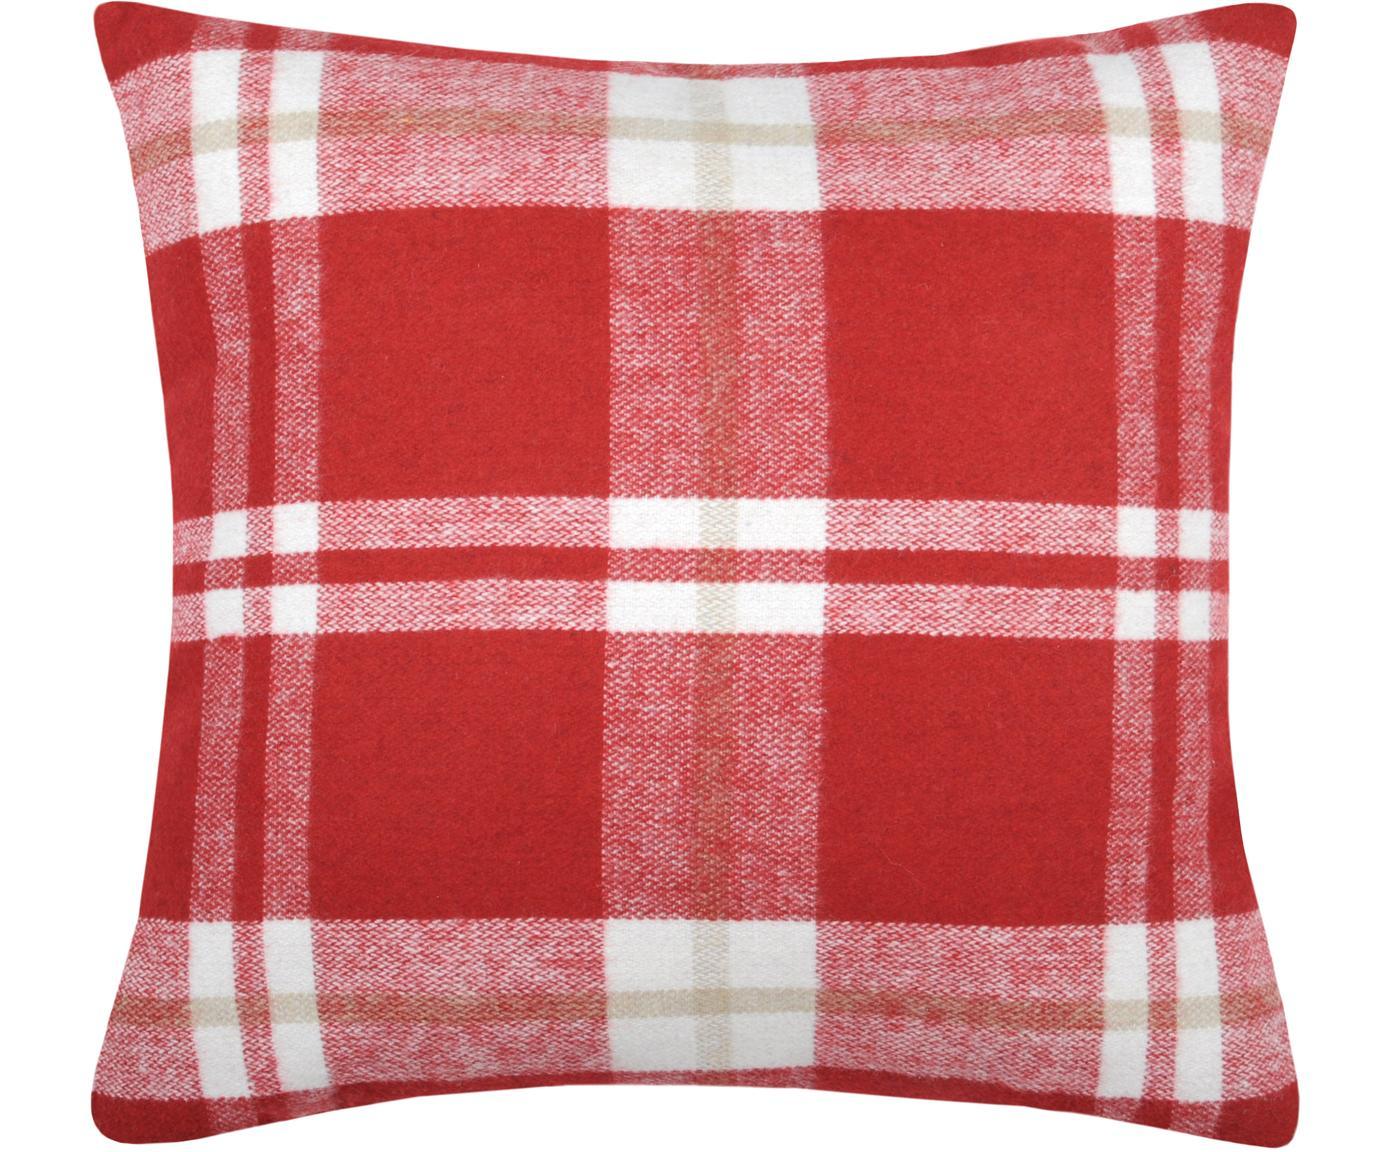 Karierte Kissenhülle Granier, 95% Polyester, 5% Wolle, Rot, Weiss, Beige, 40 x 40 cm